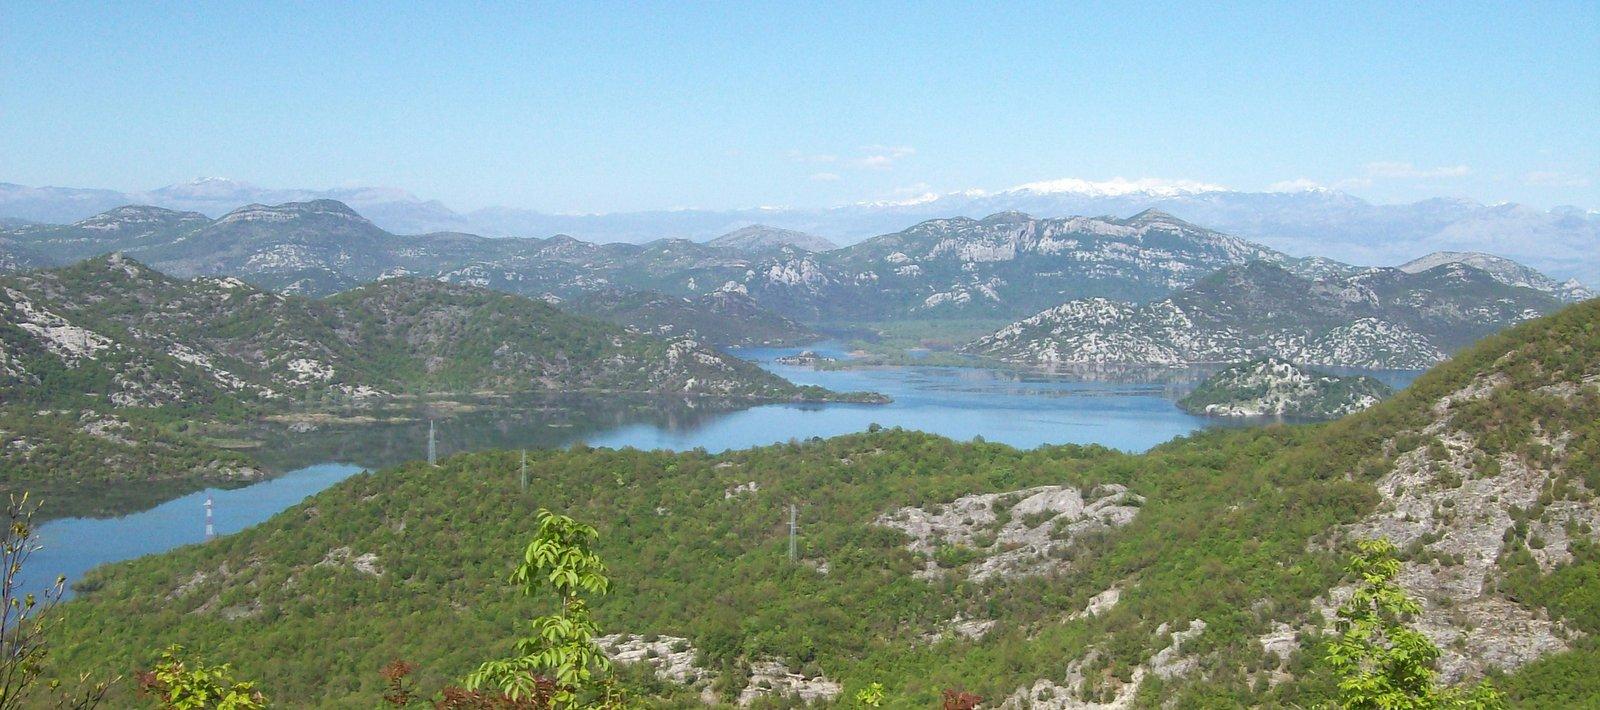 Crnojevica - Montenegro